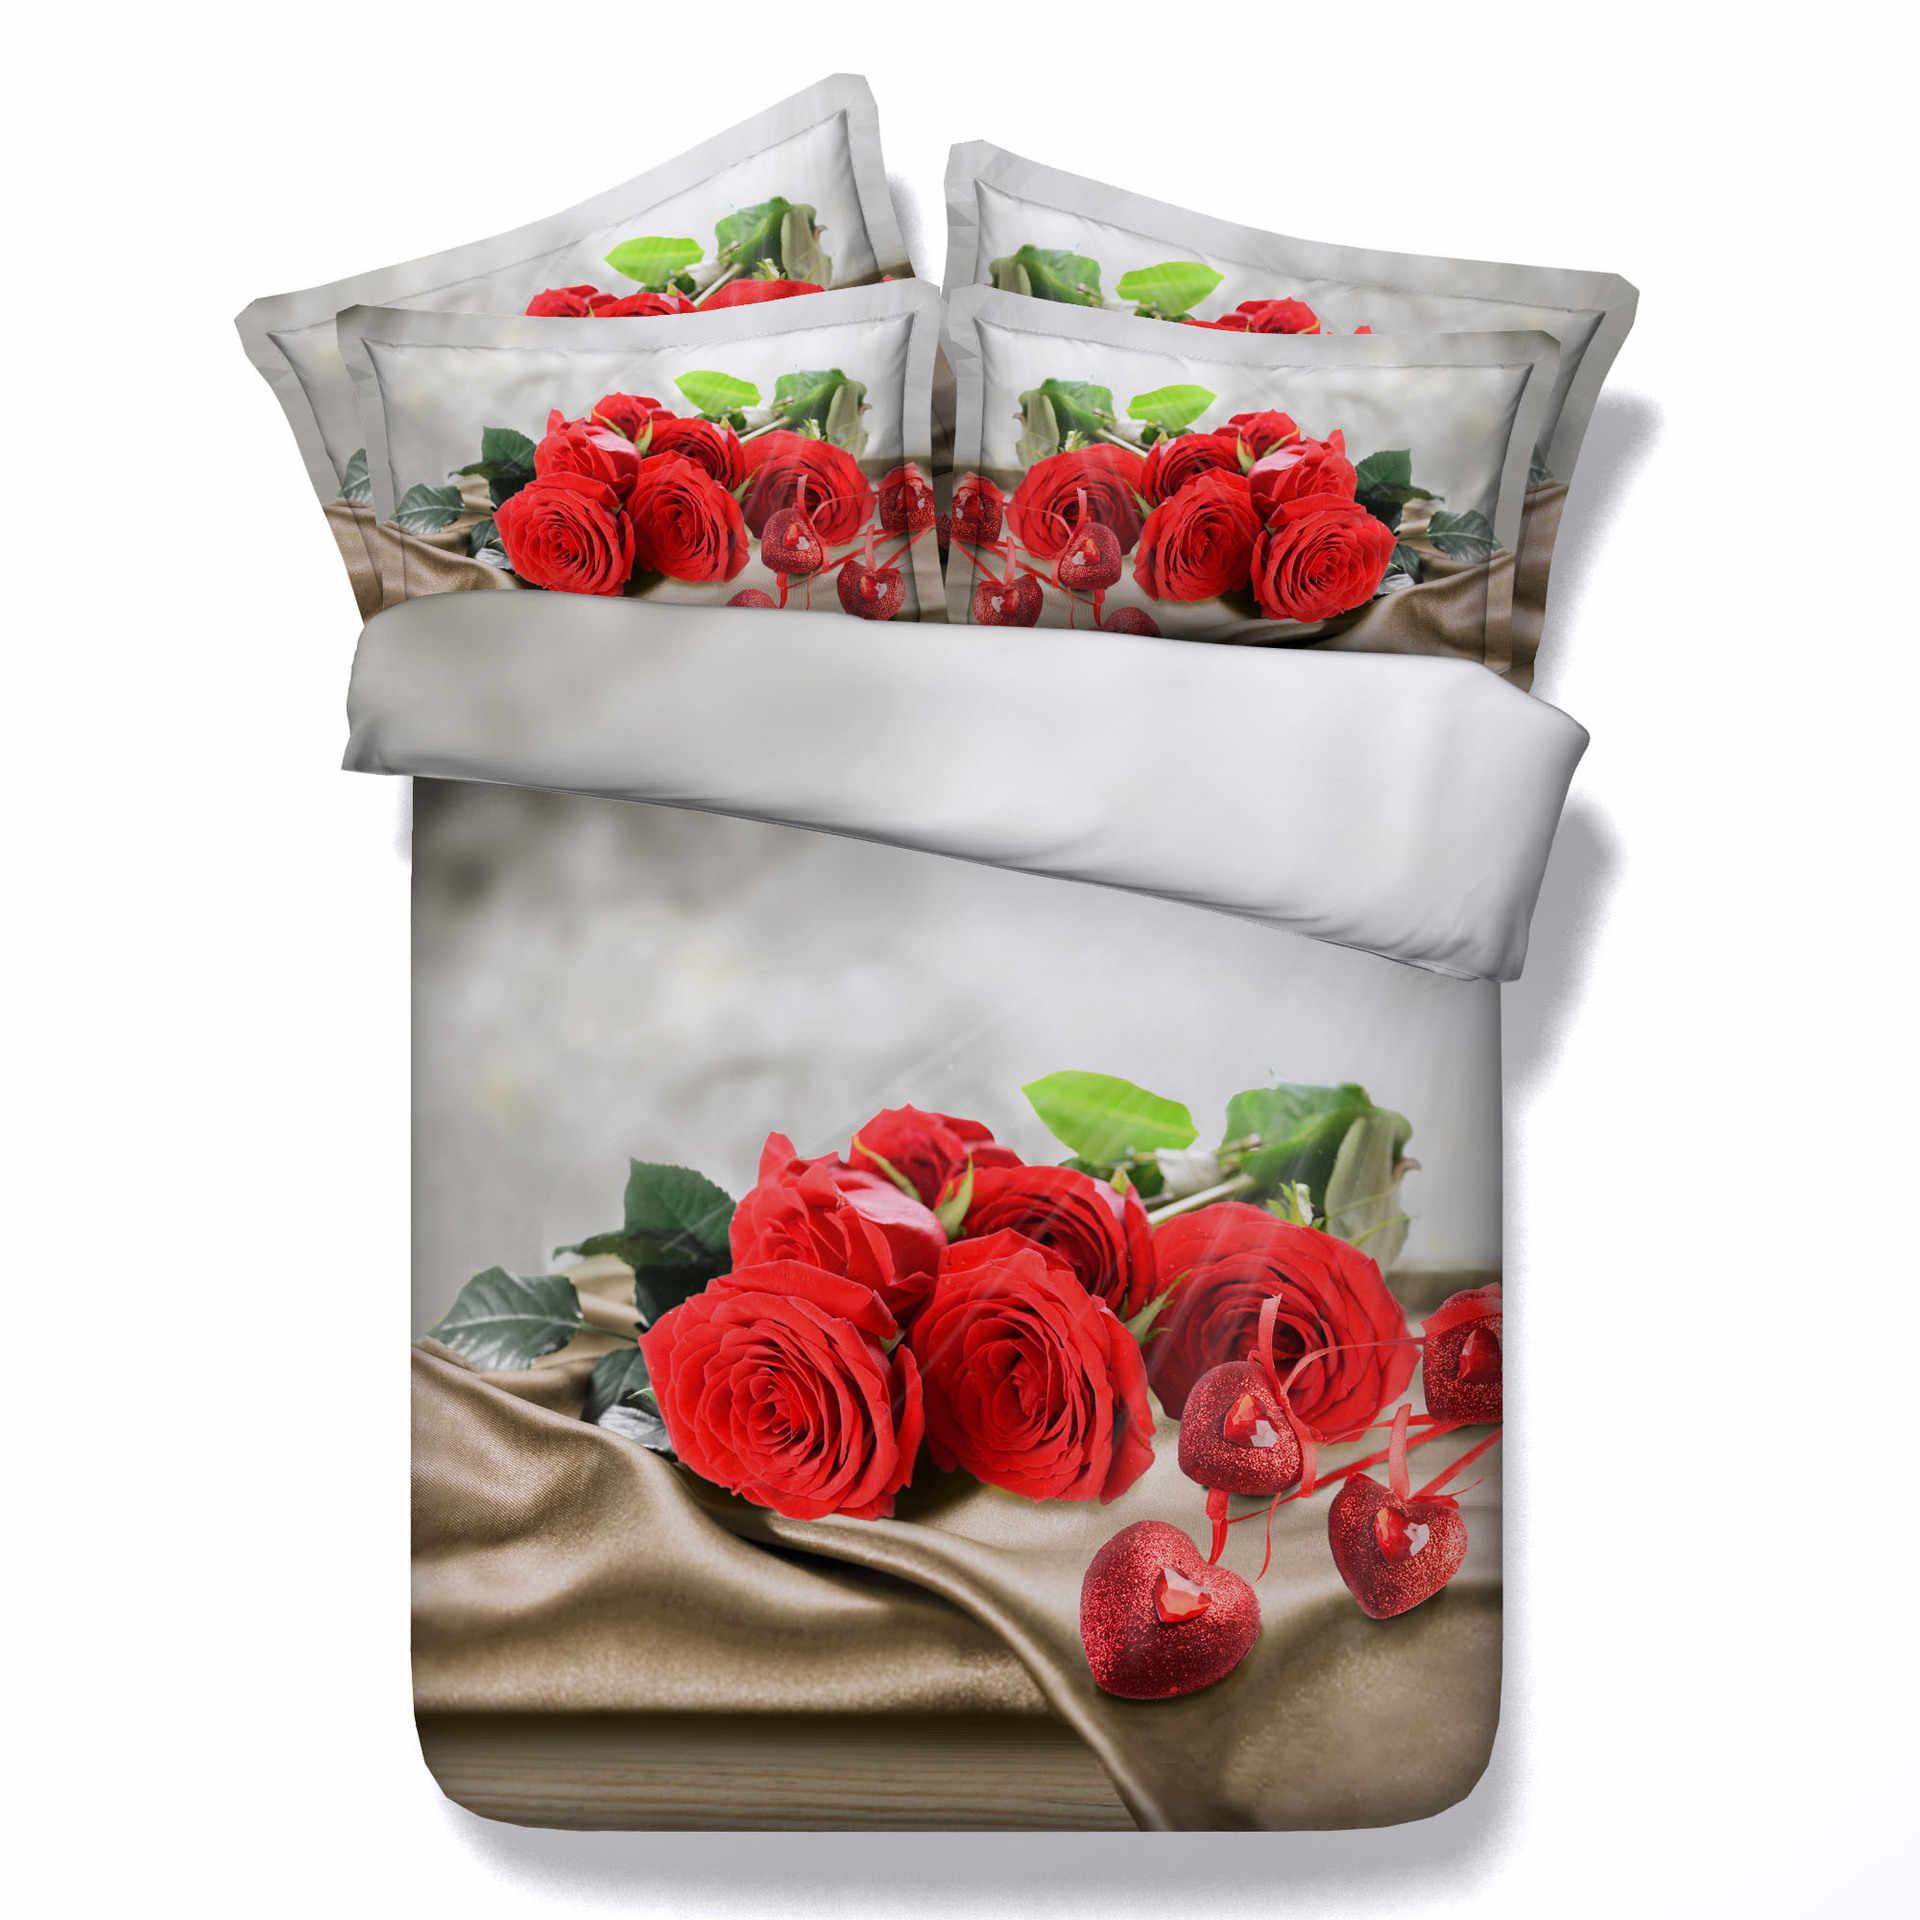 Silk rose Digital print Bedding Set  Quilt Cover  Design Bed Set Bohemian a Mini Van Bedclothes 3pcs Large size 260*225cm JF361